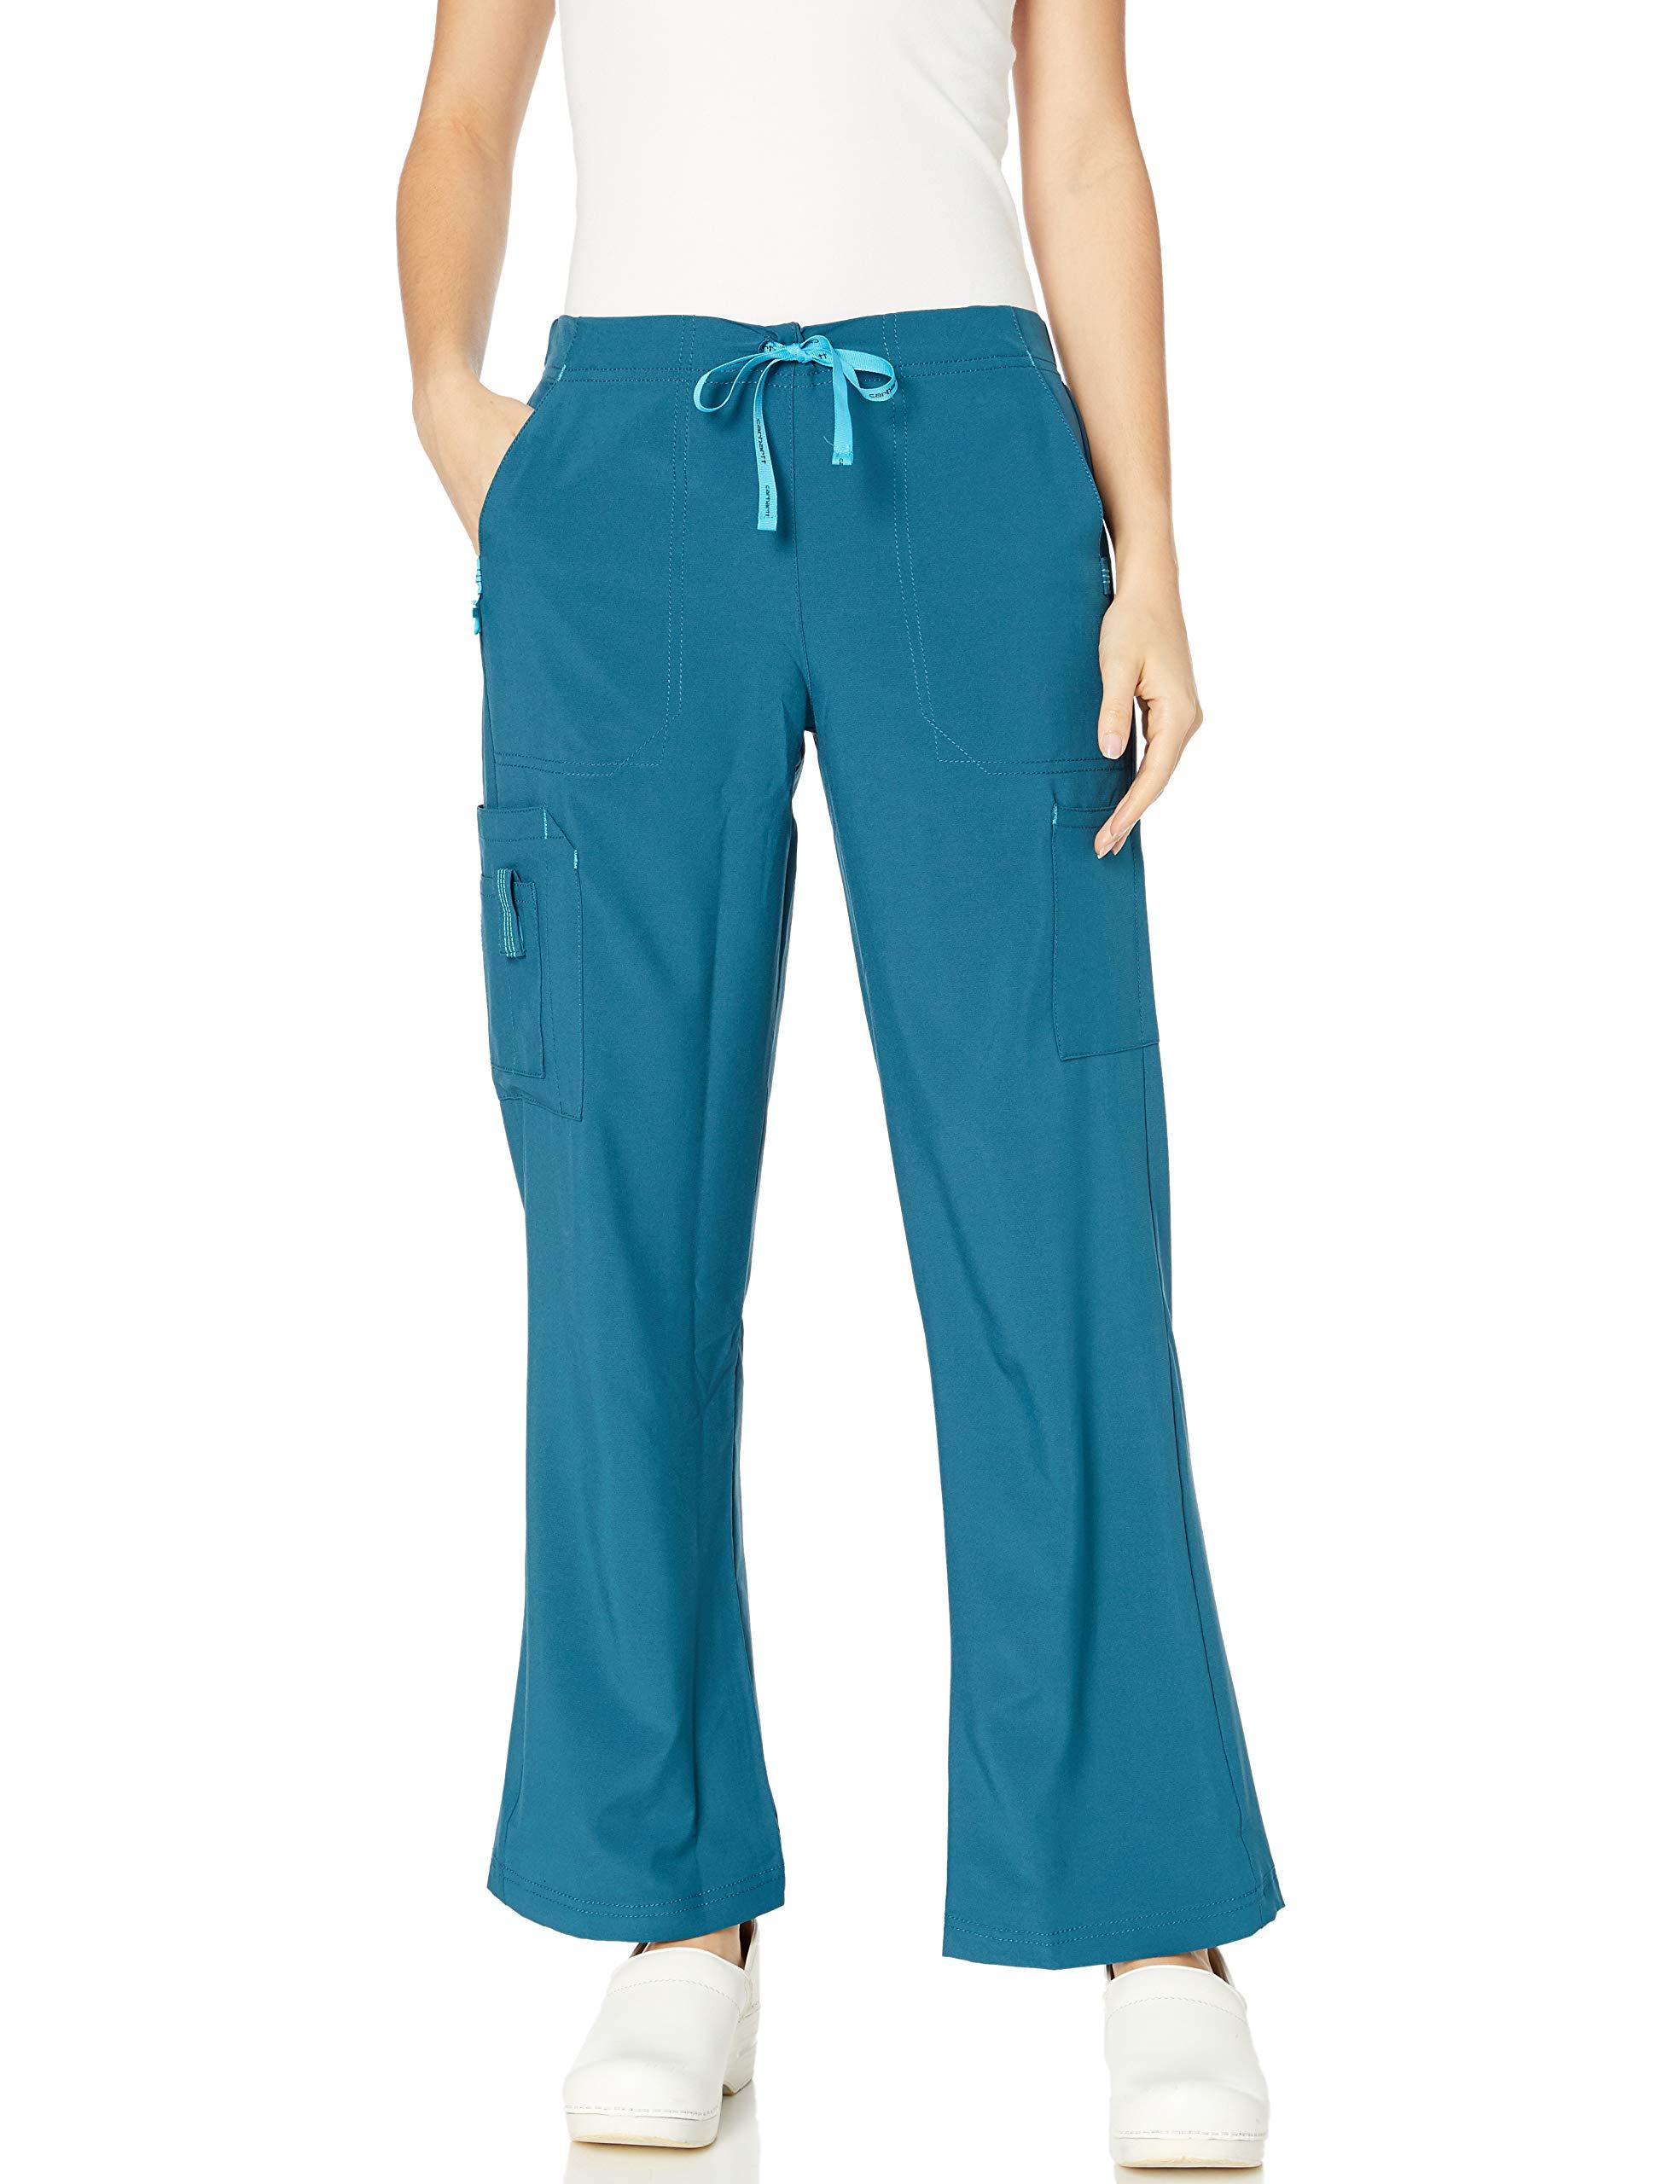 Carhartt Cross-Flex Women's Utility Scrub Pant Petite